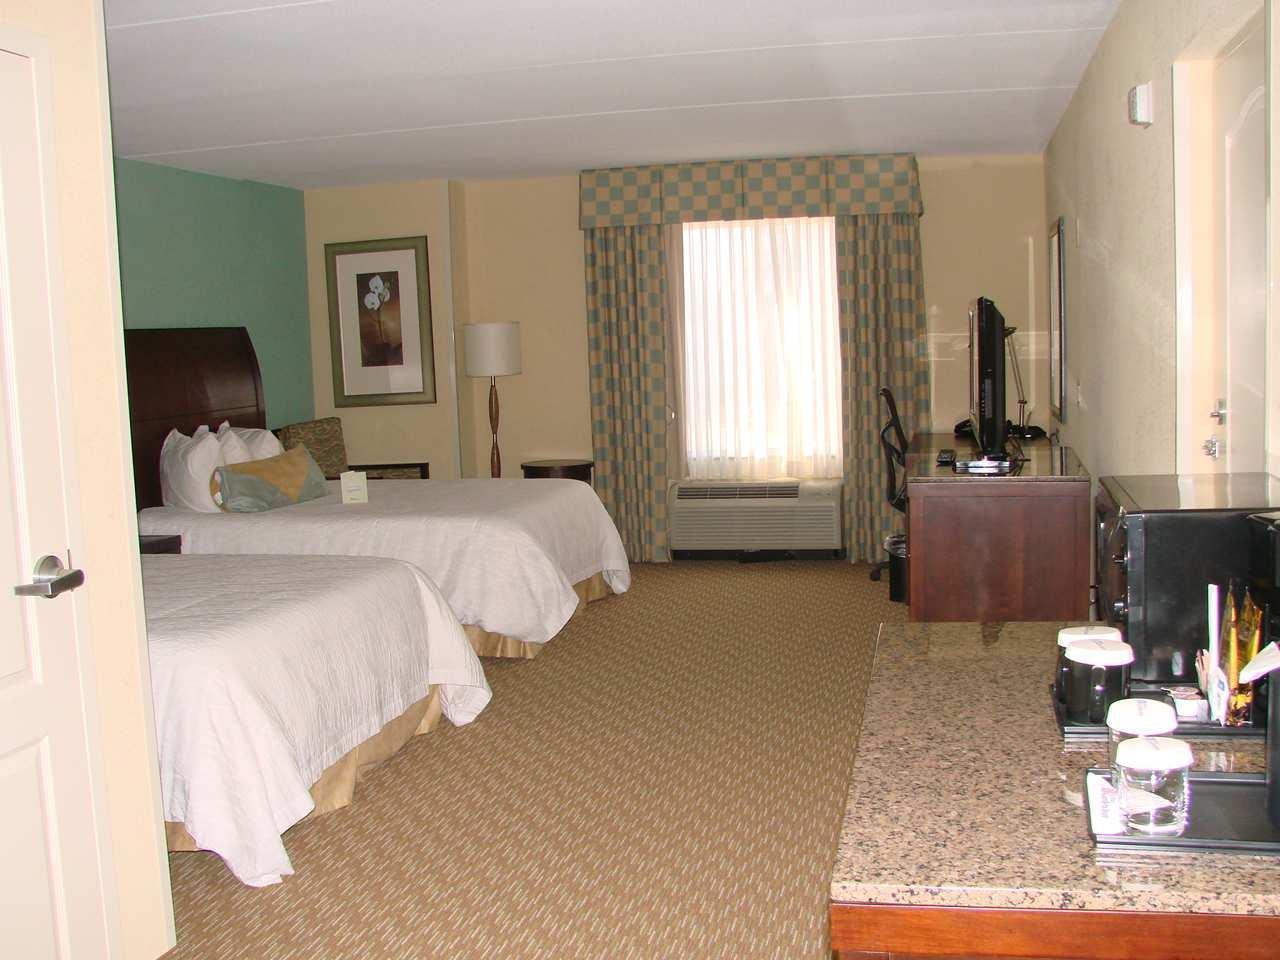 Hilton Garden Inn Gainesville image 15